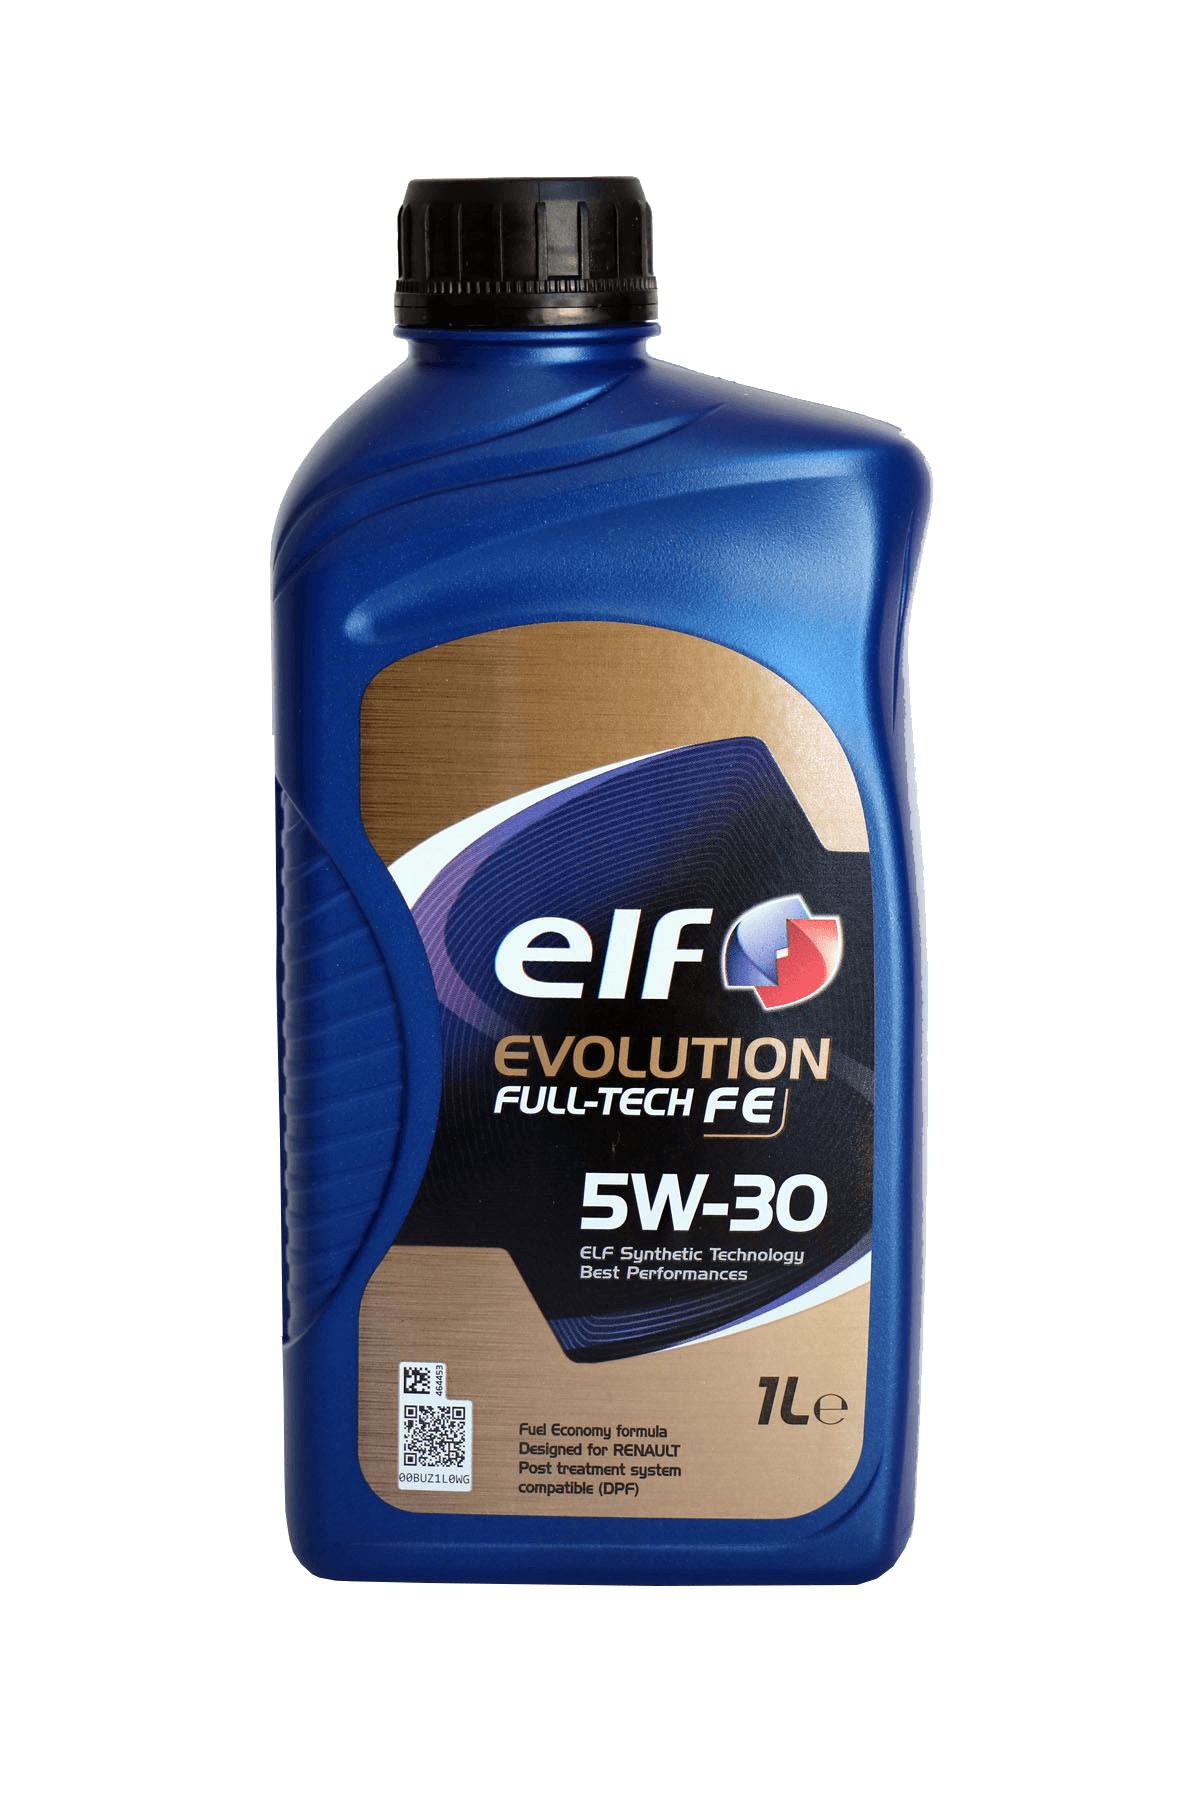 ELF Evolution Full-Tech FE 5W-30 Motoröl, 1l